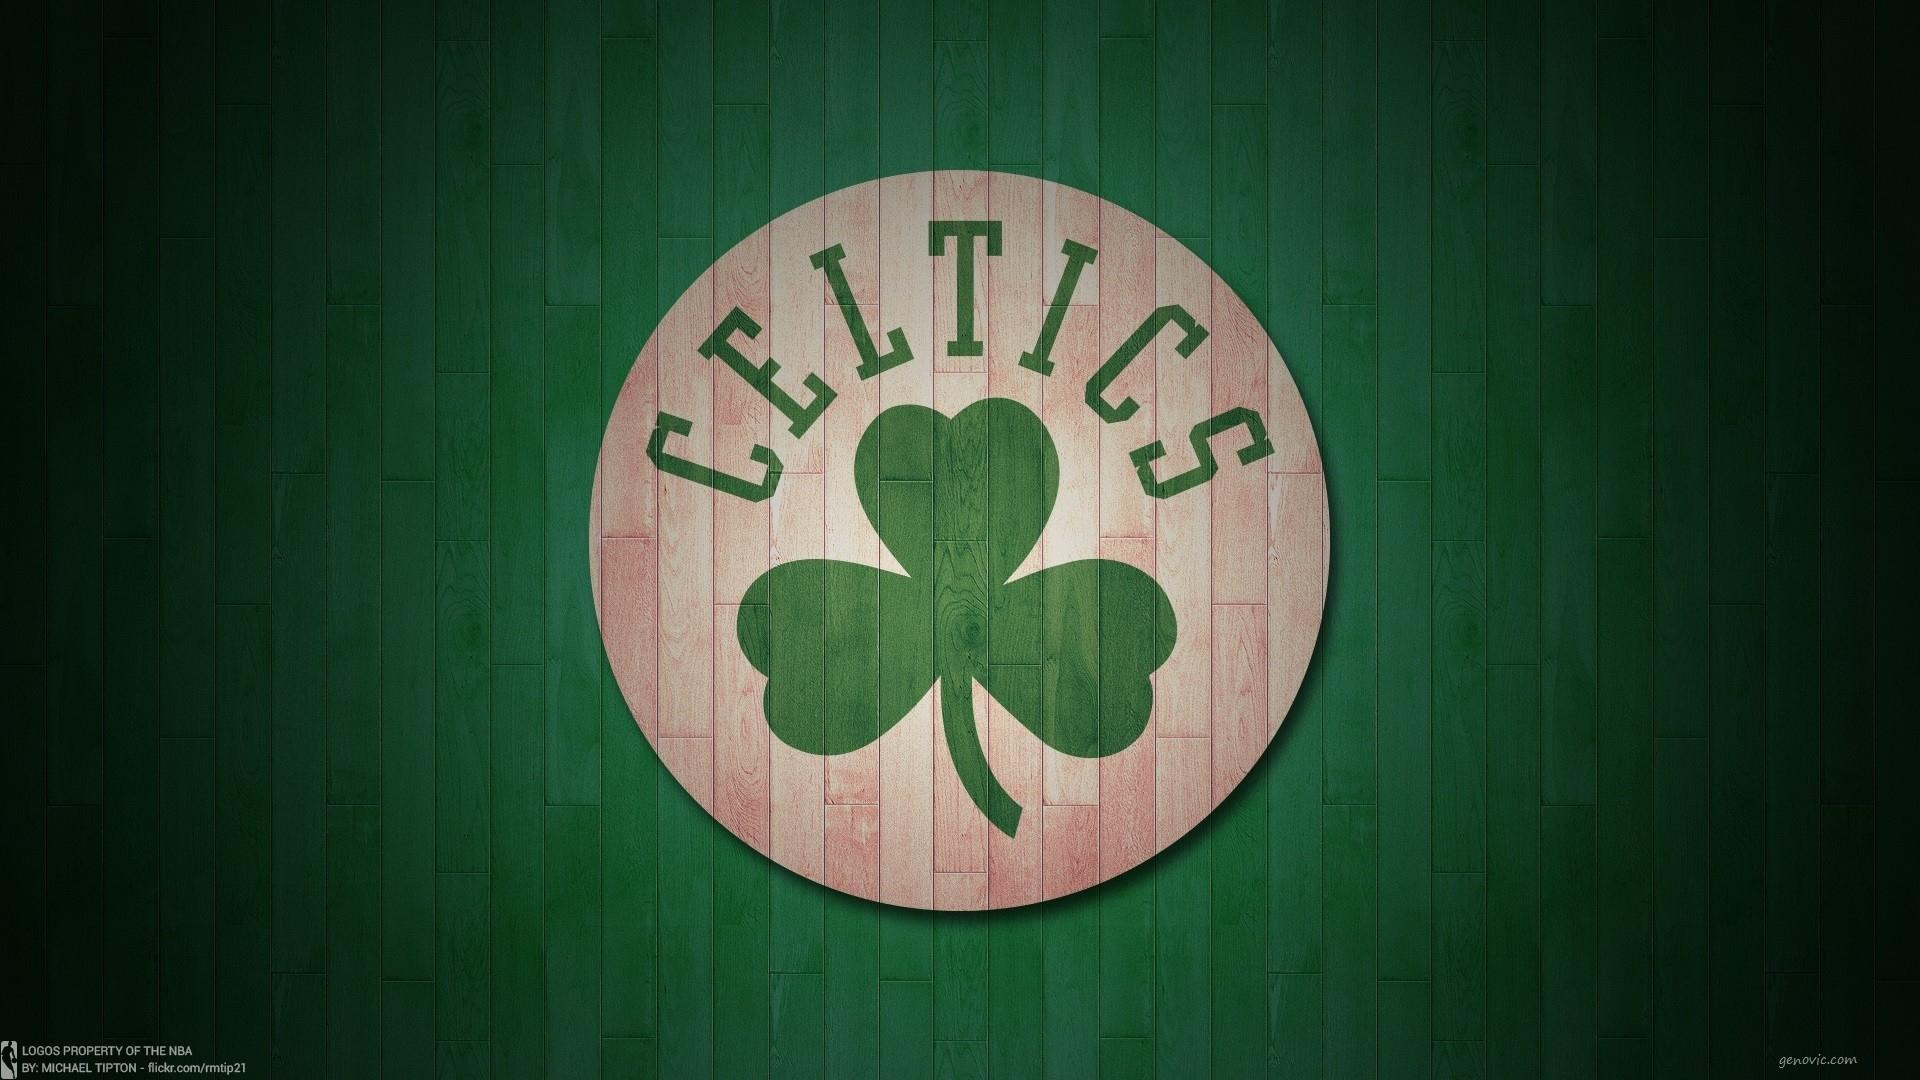 boston celtics wallpaper hd (64+ images)